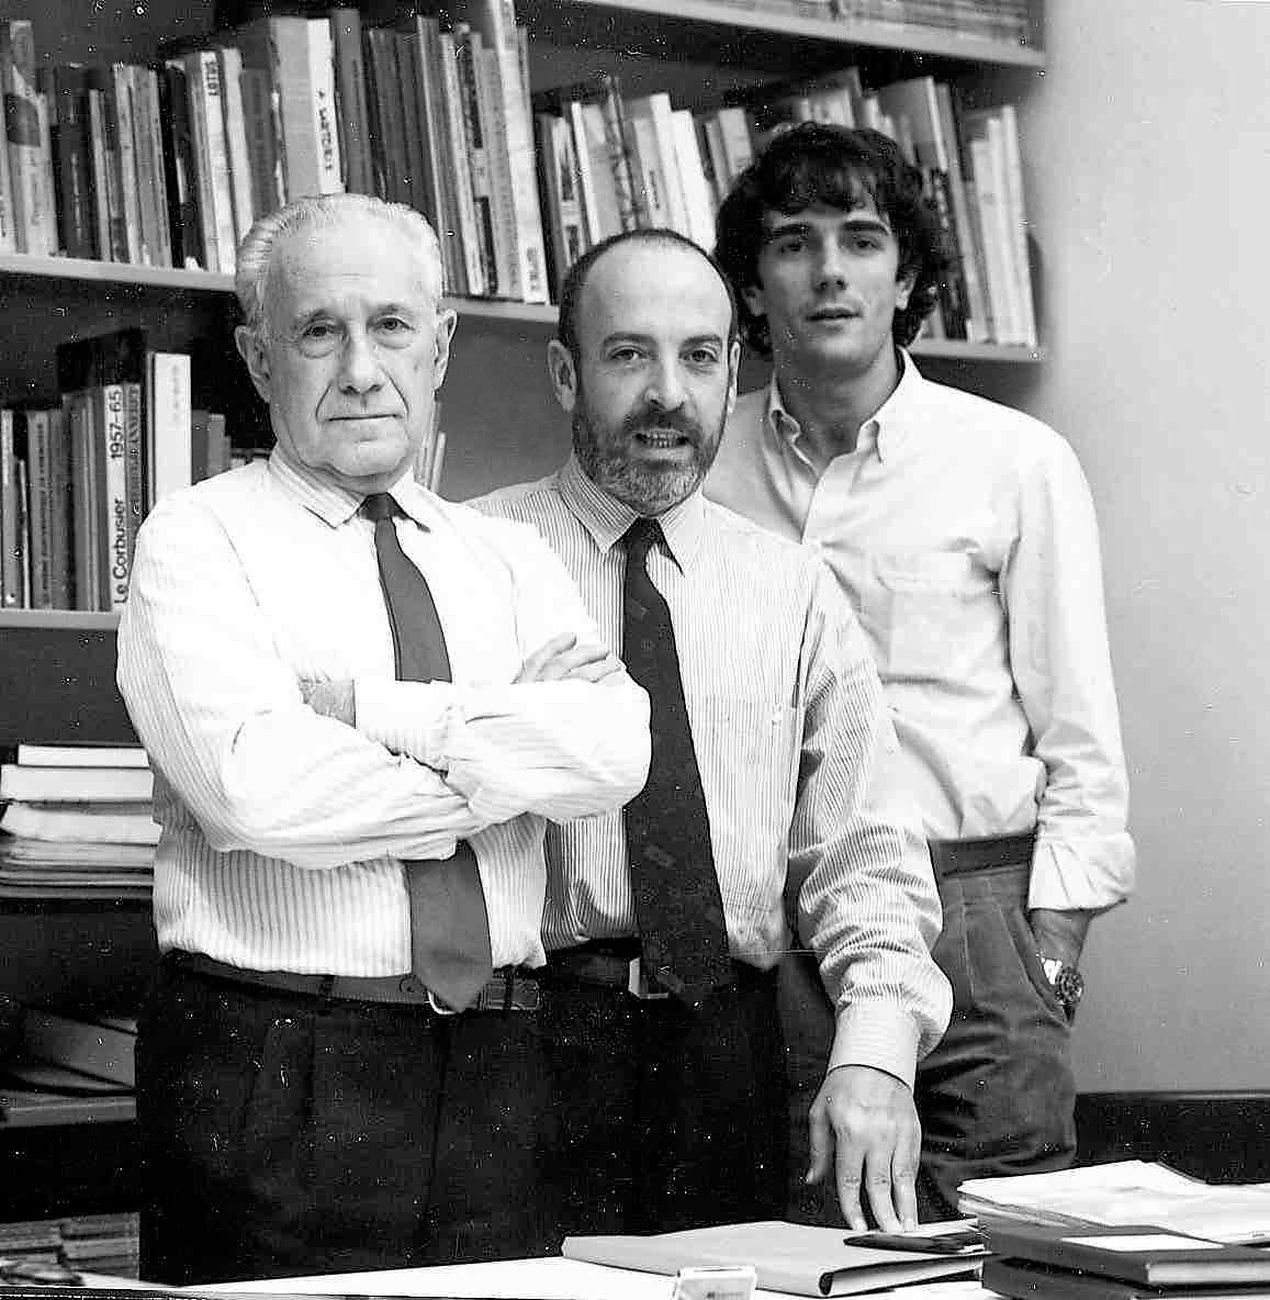 Eugenio Gentili Tedeschi, Gianni Calzà, Andrea Savio Architetti Associati